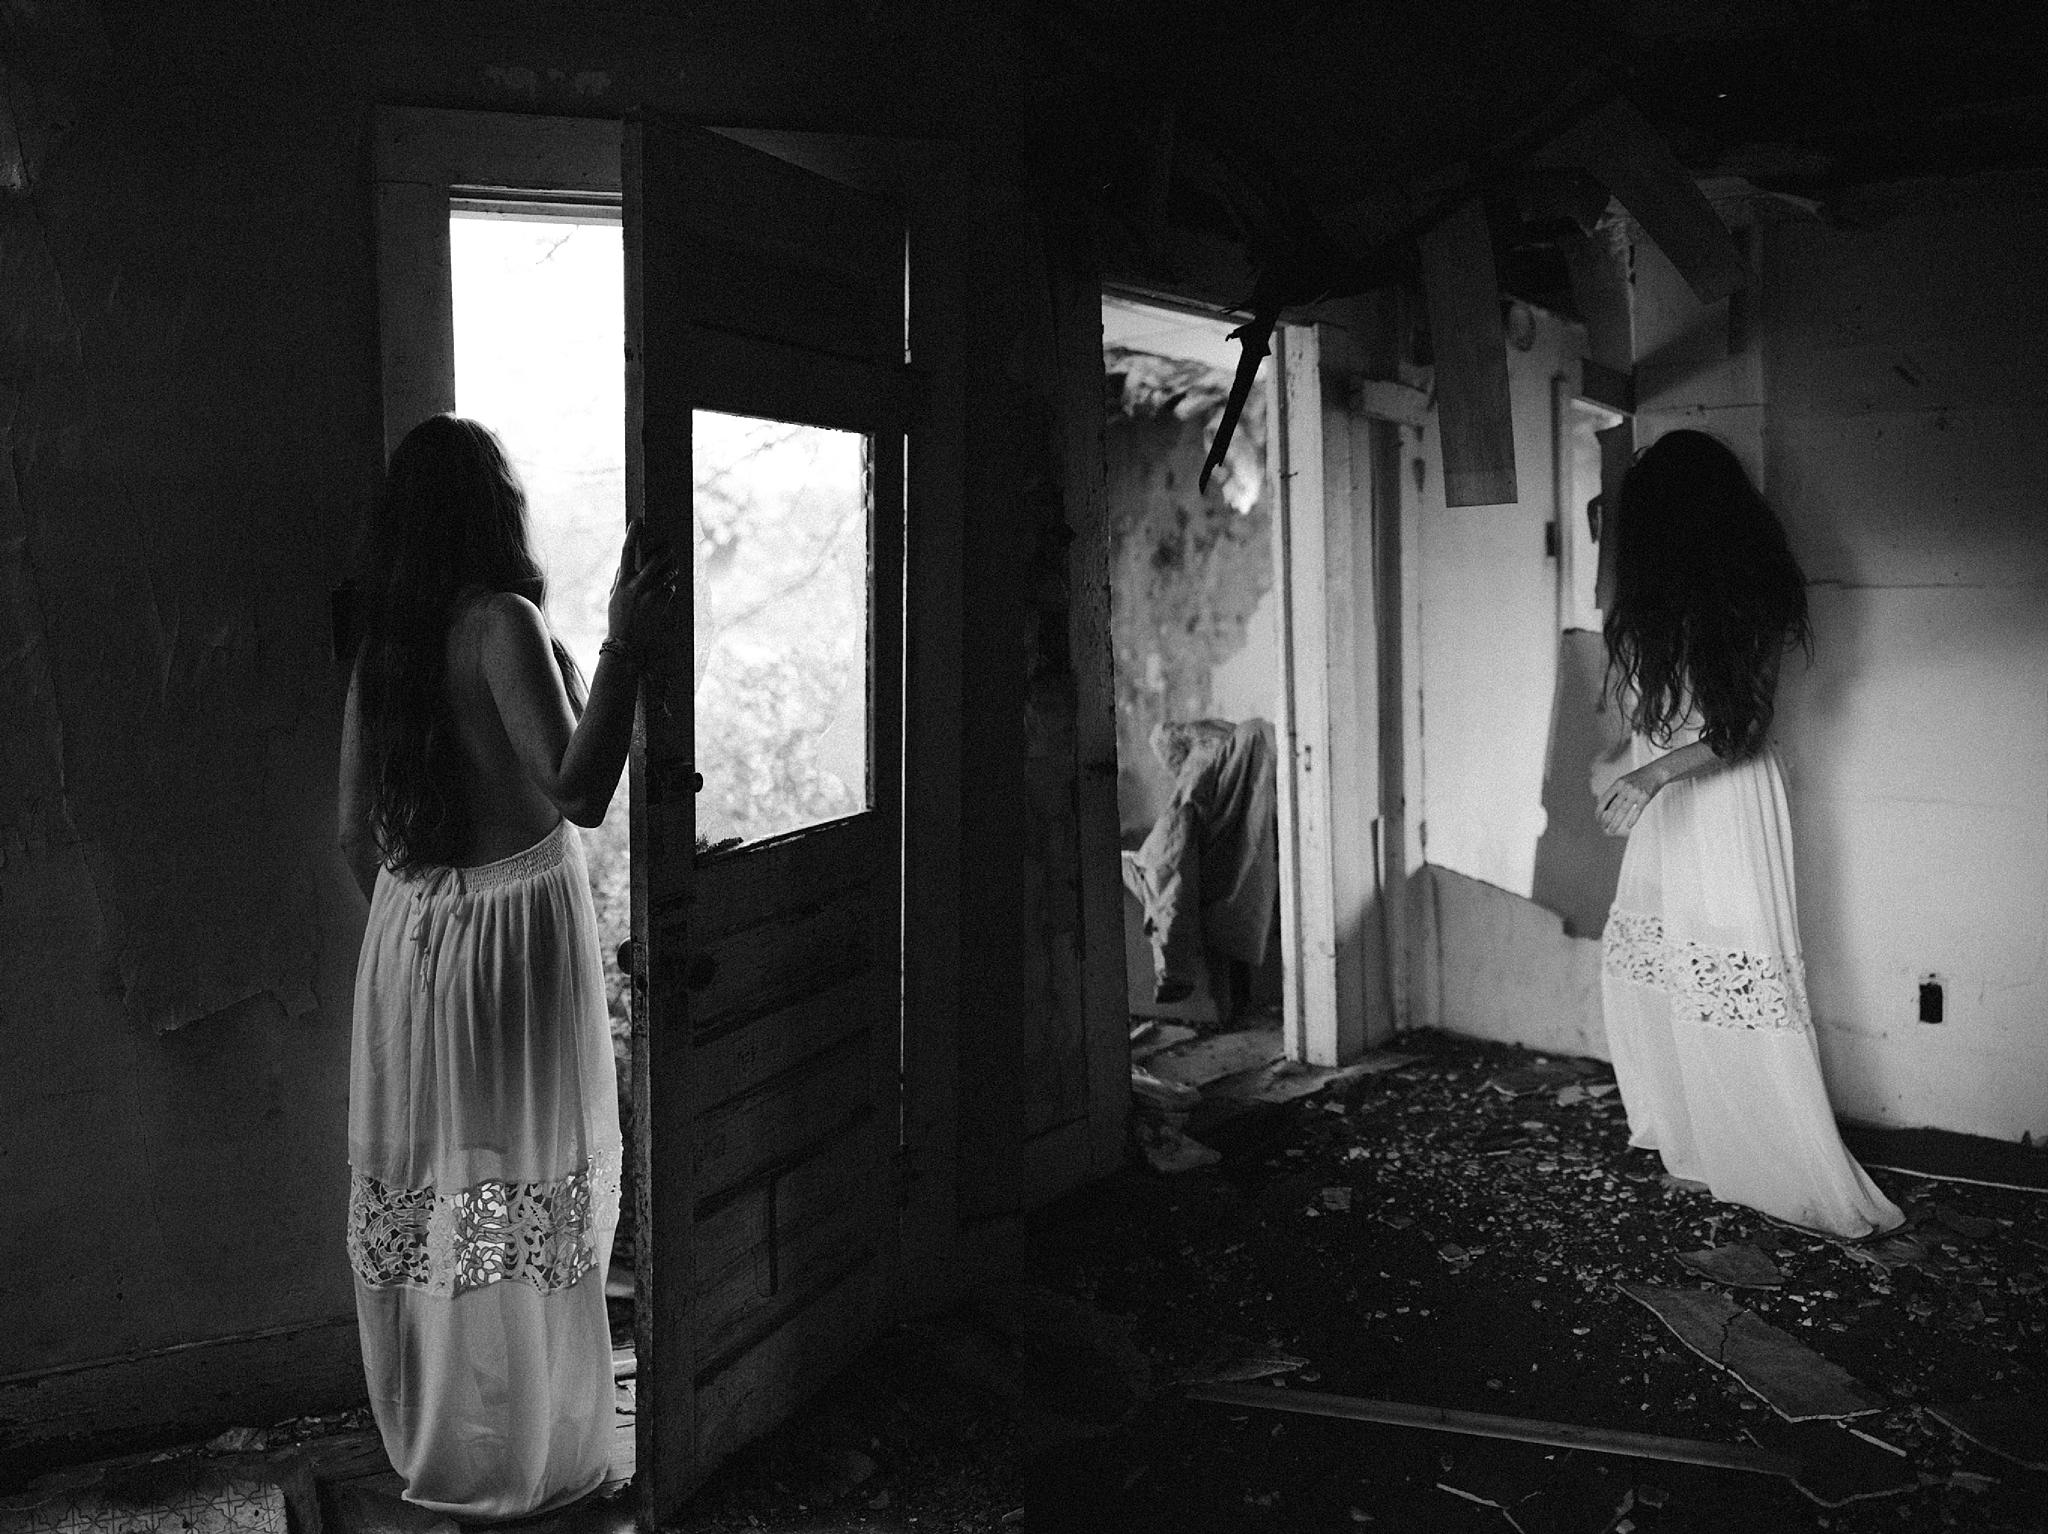 twyla jones photography - west palm beach florida photographer - boudoir in an old house-4911_treasure coast florida-1.jpg